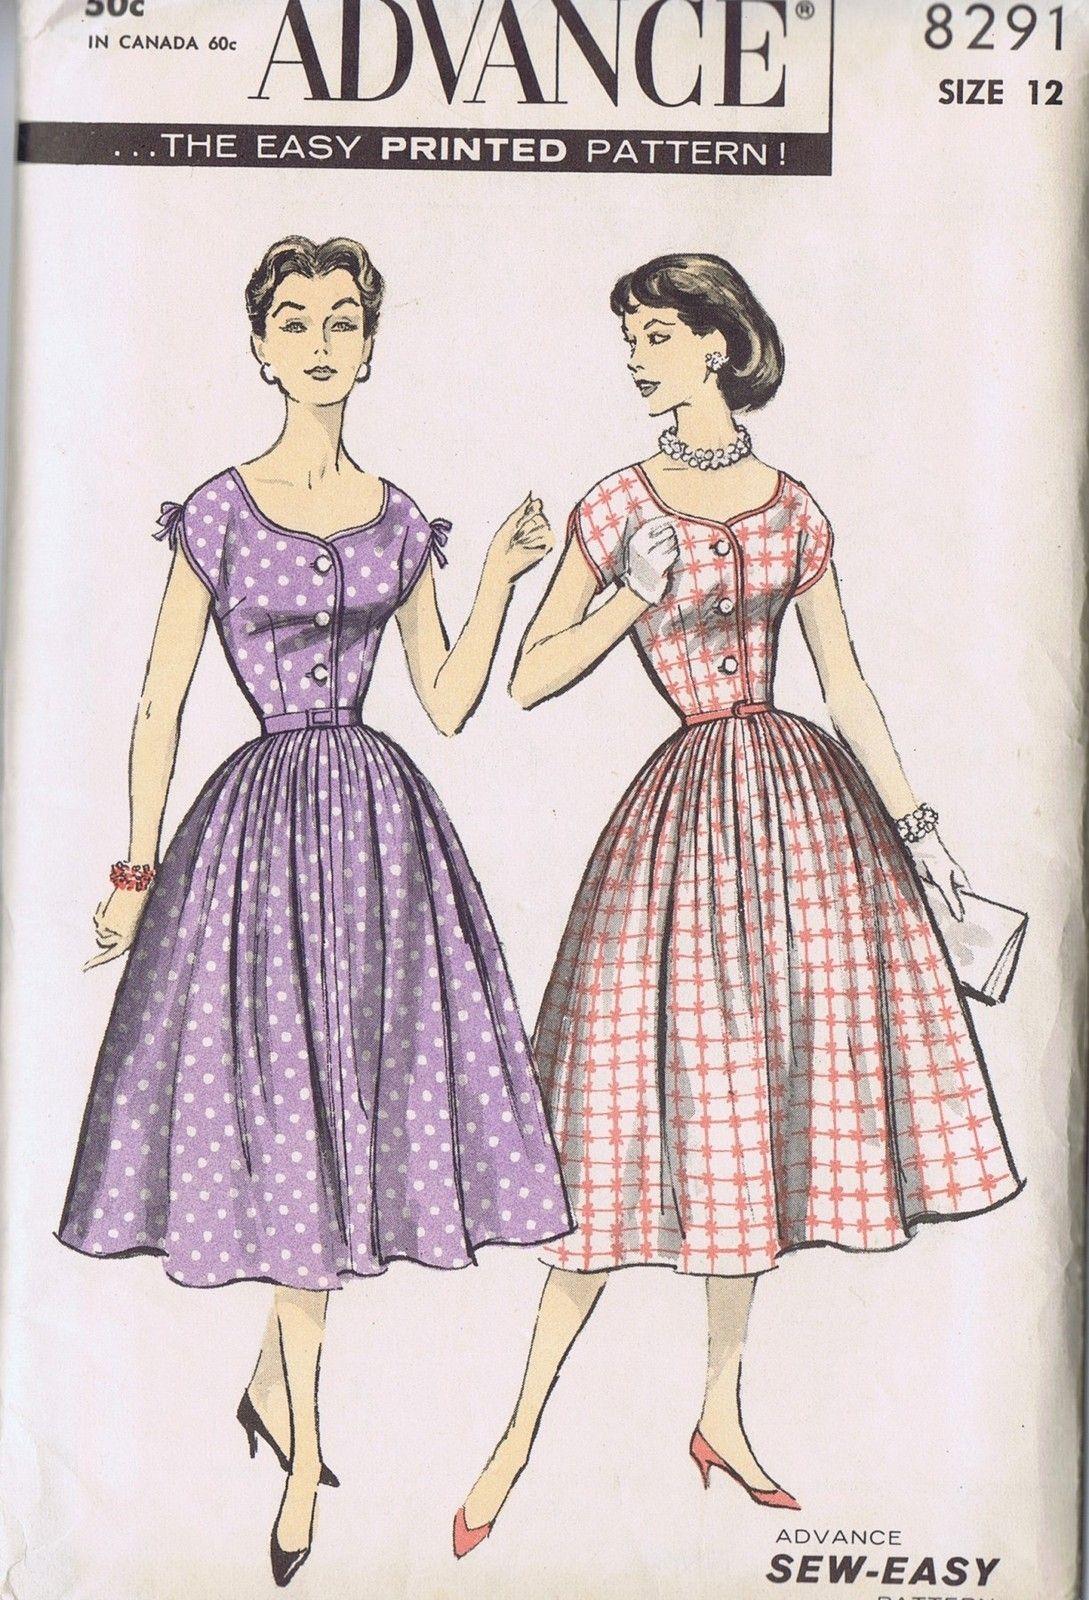 VINTAGE 1 PIECE DRESS 50s SEWING PATTERN 8291 ADVANCE SZ 12 BUST 30 HIP 33 UNCUT | eBay